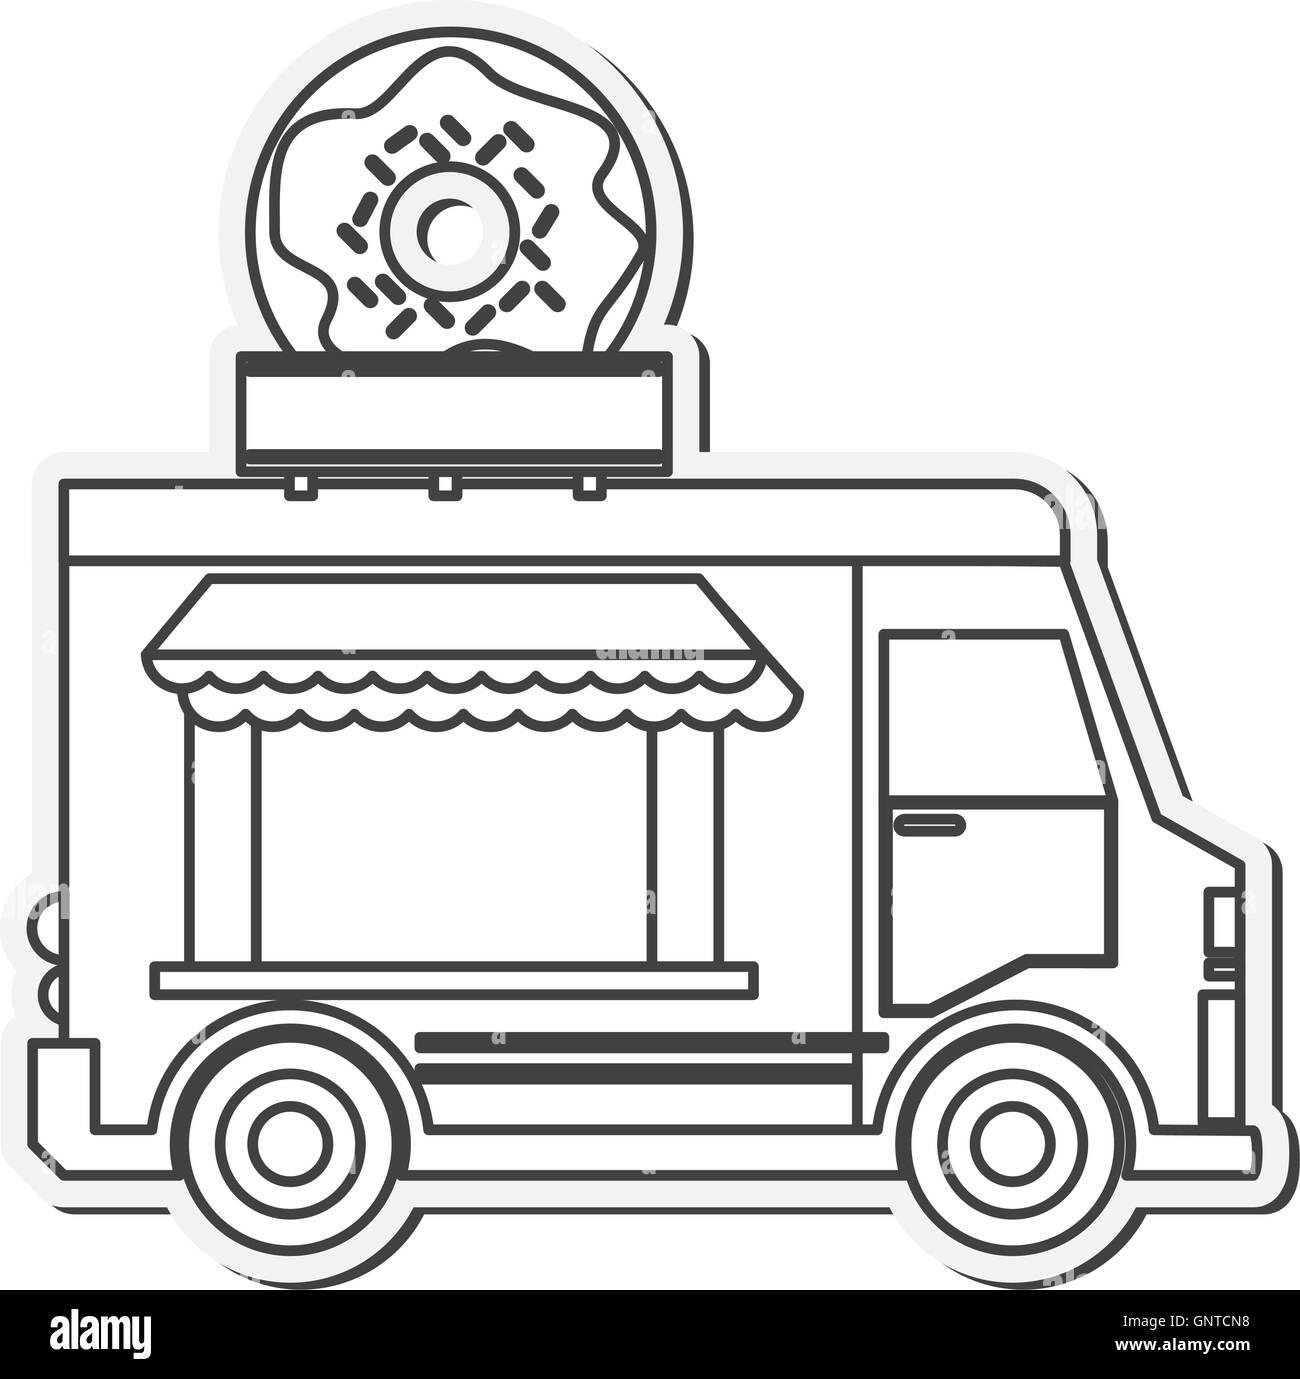 Food Truck Delivery Design